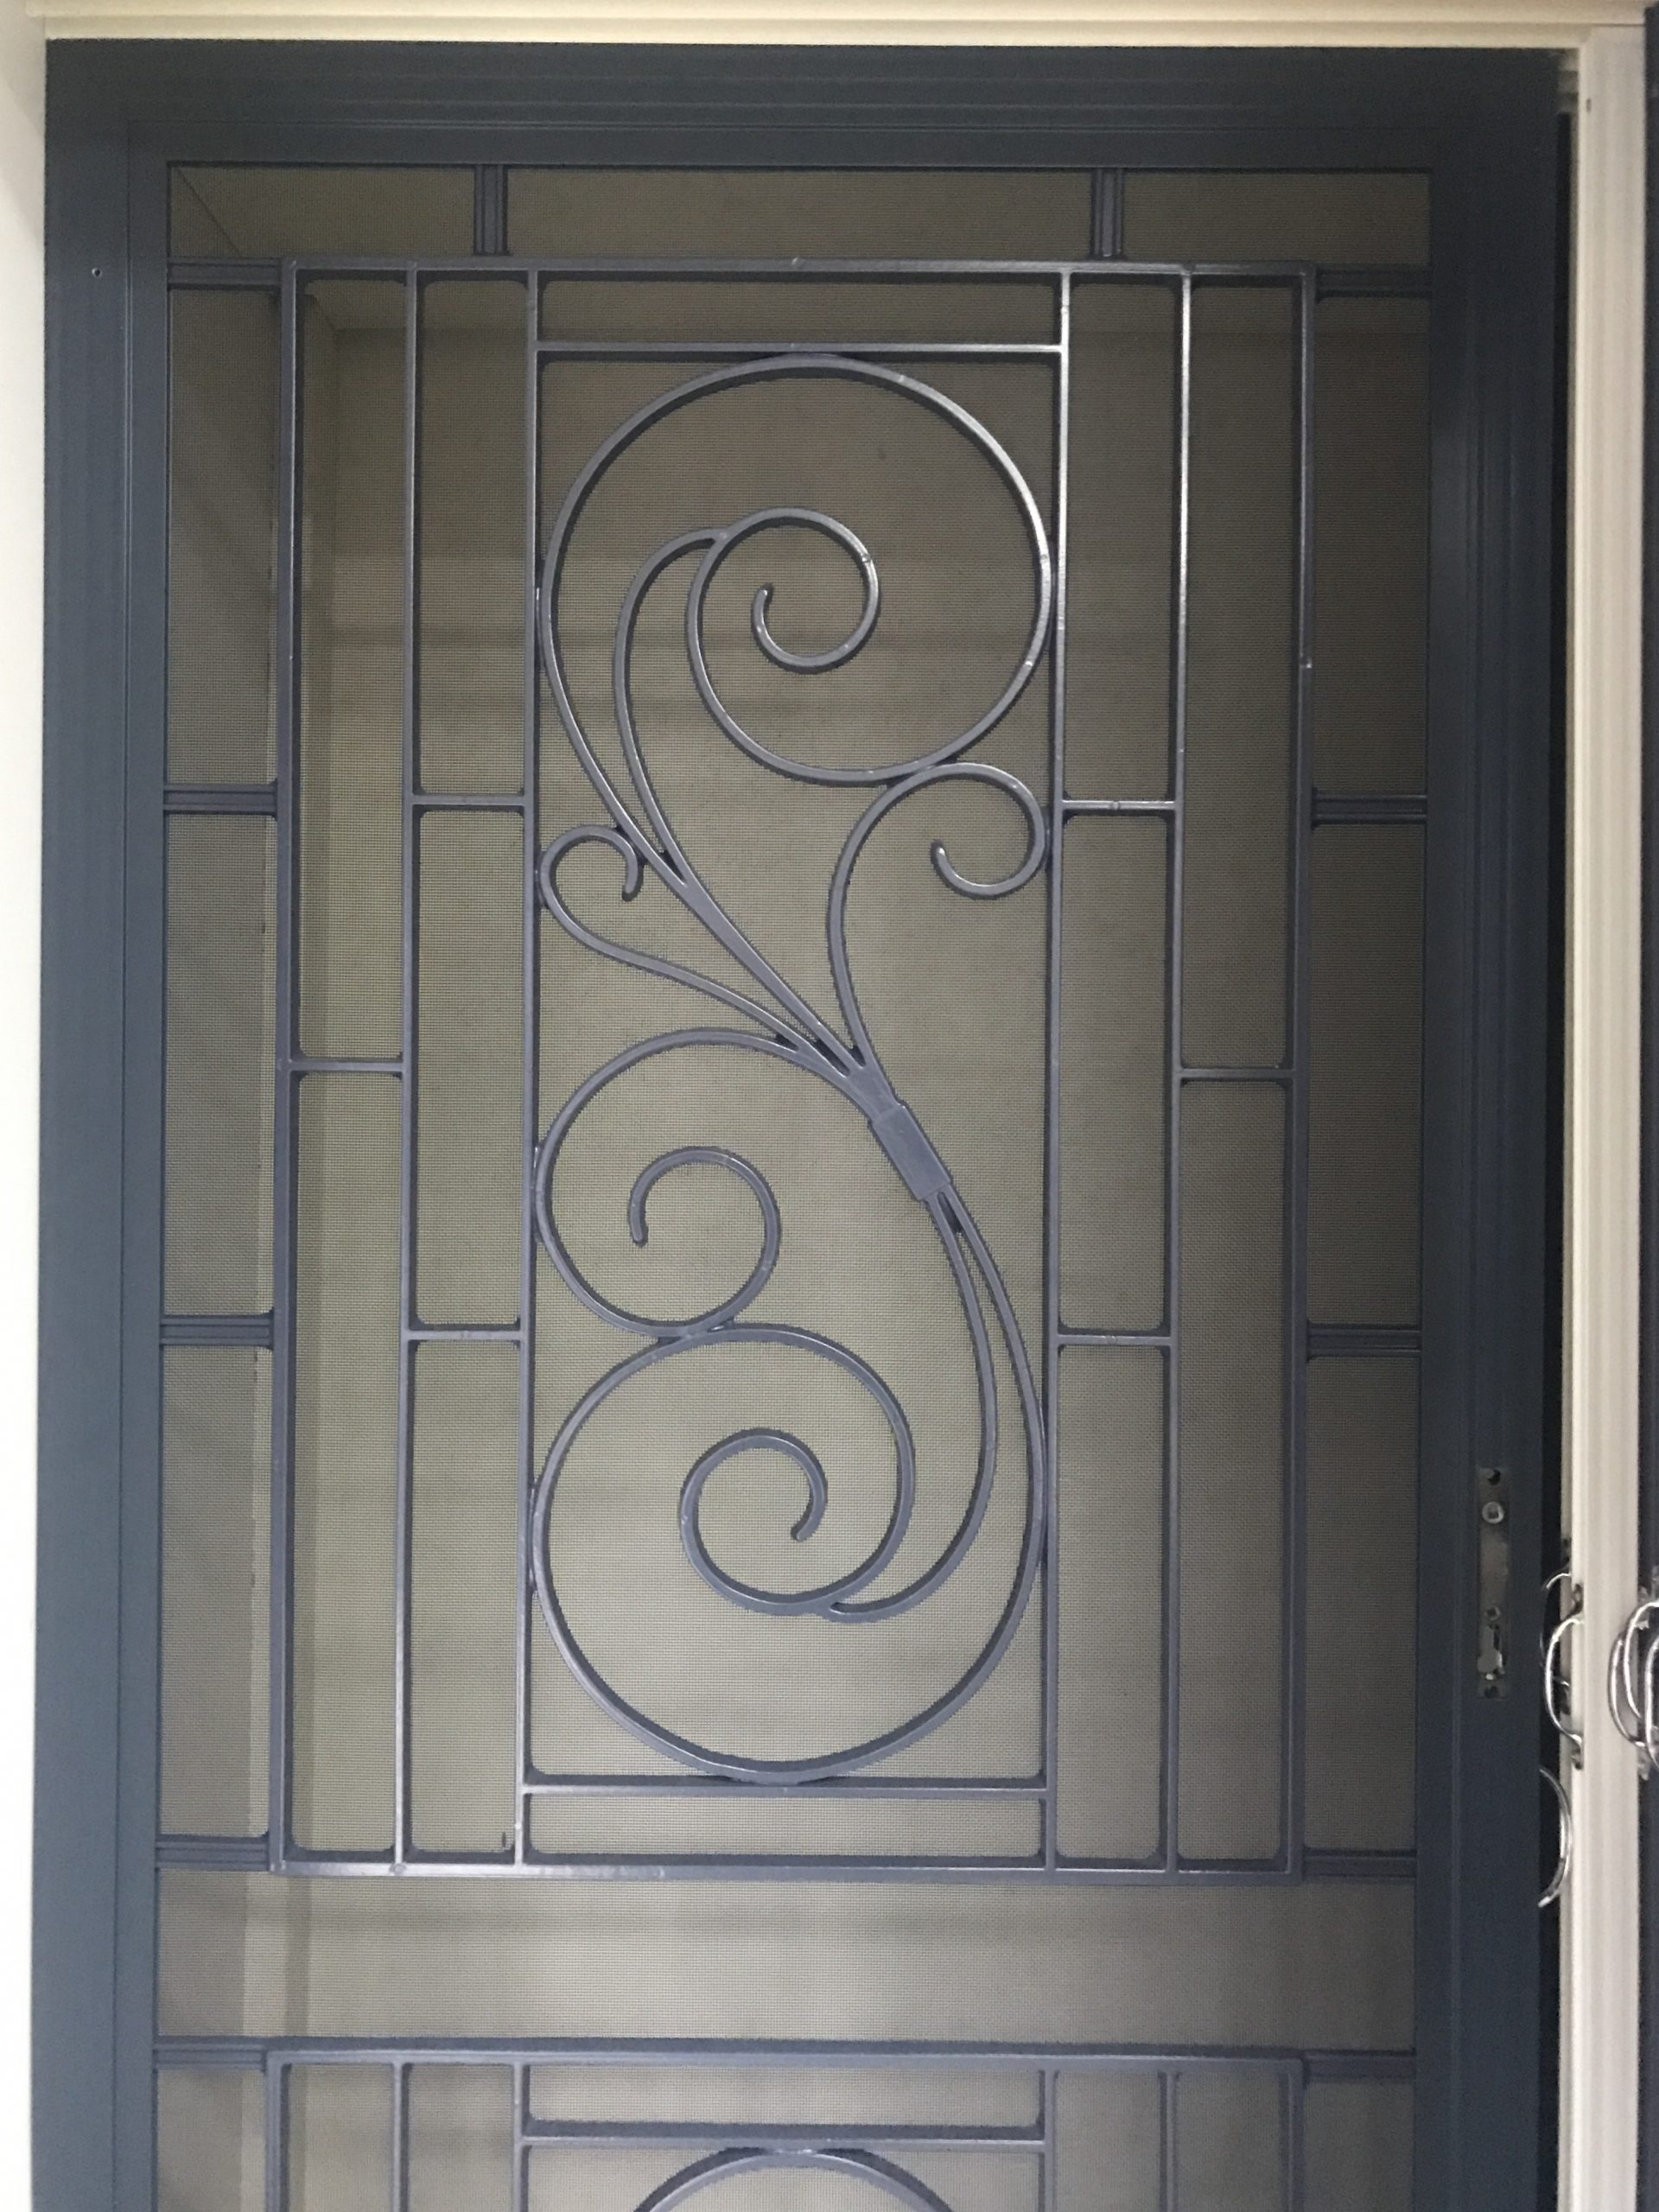 Colonial casting doors on sale at zeee.com.au